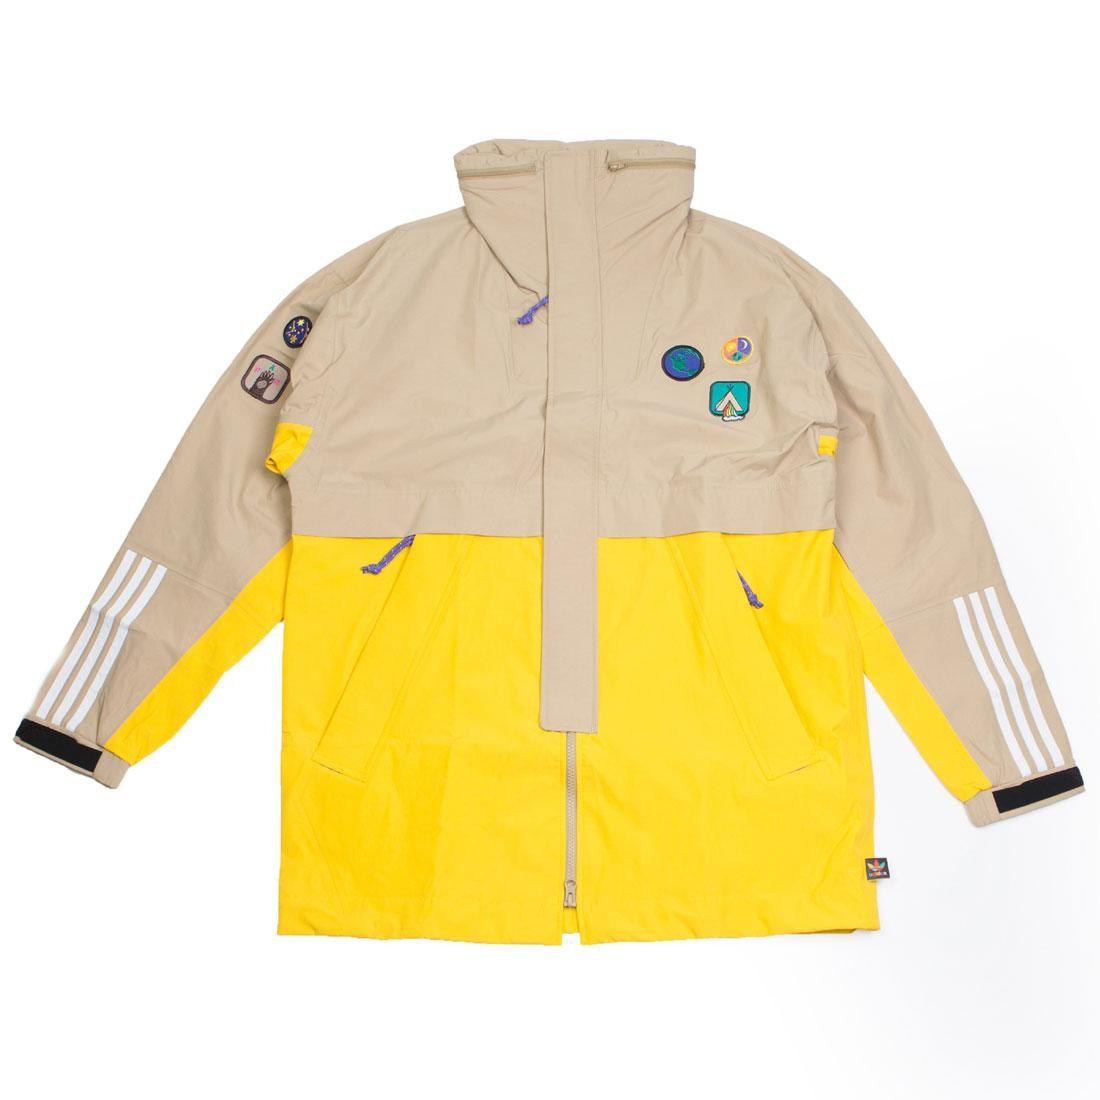 e8ea431322b22 Adidas x Pharrell Williams Men Hu Hiking 3-Layer Jacket beige hemp eqt  yellow